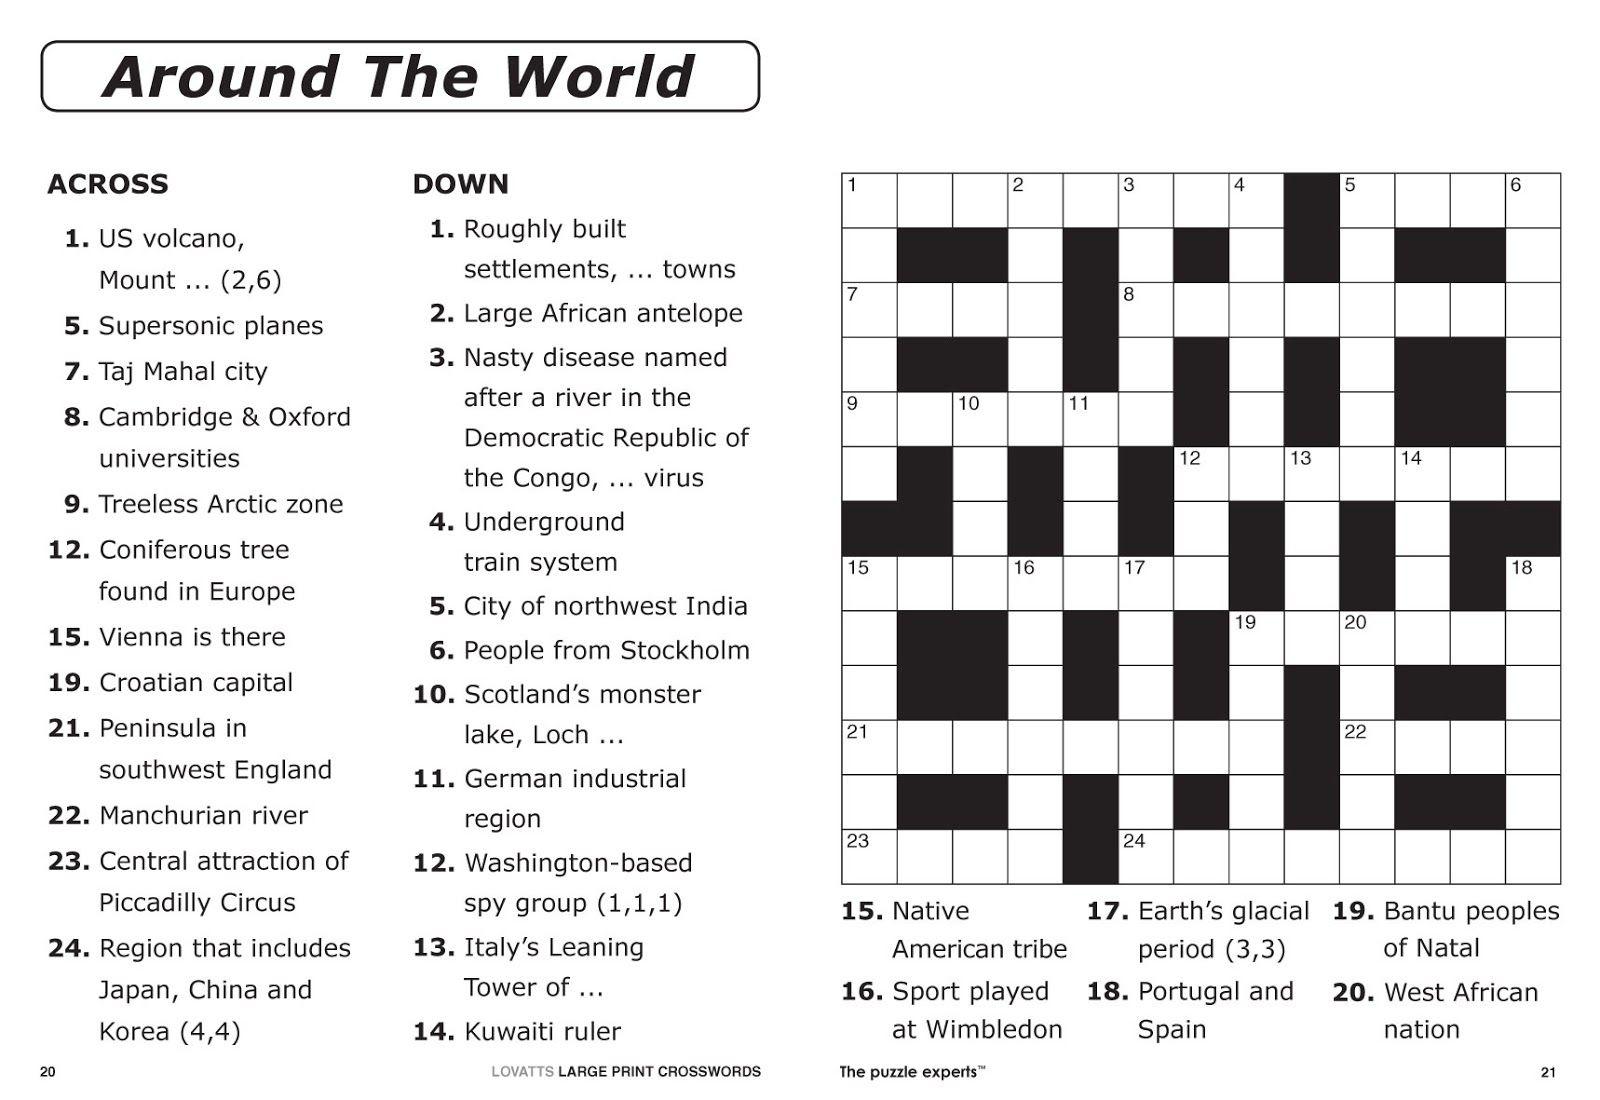 Free Printable Large Print Crossword Puzzles | M3U8 - Printable Puzzles Crosswords